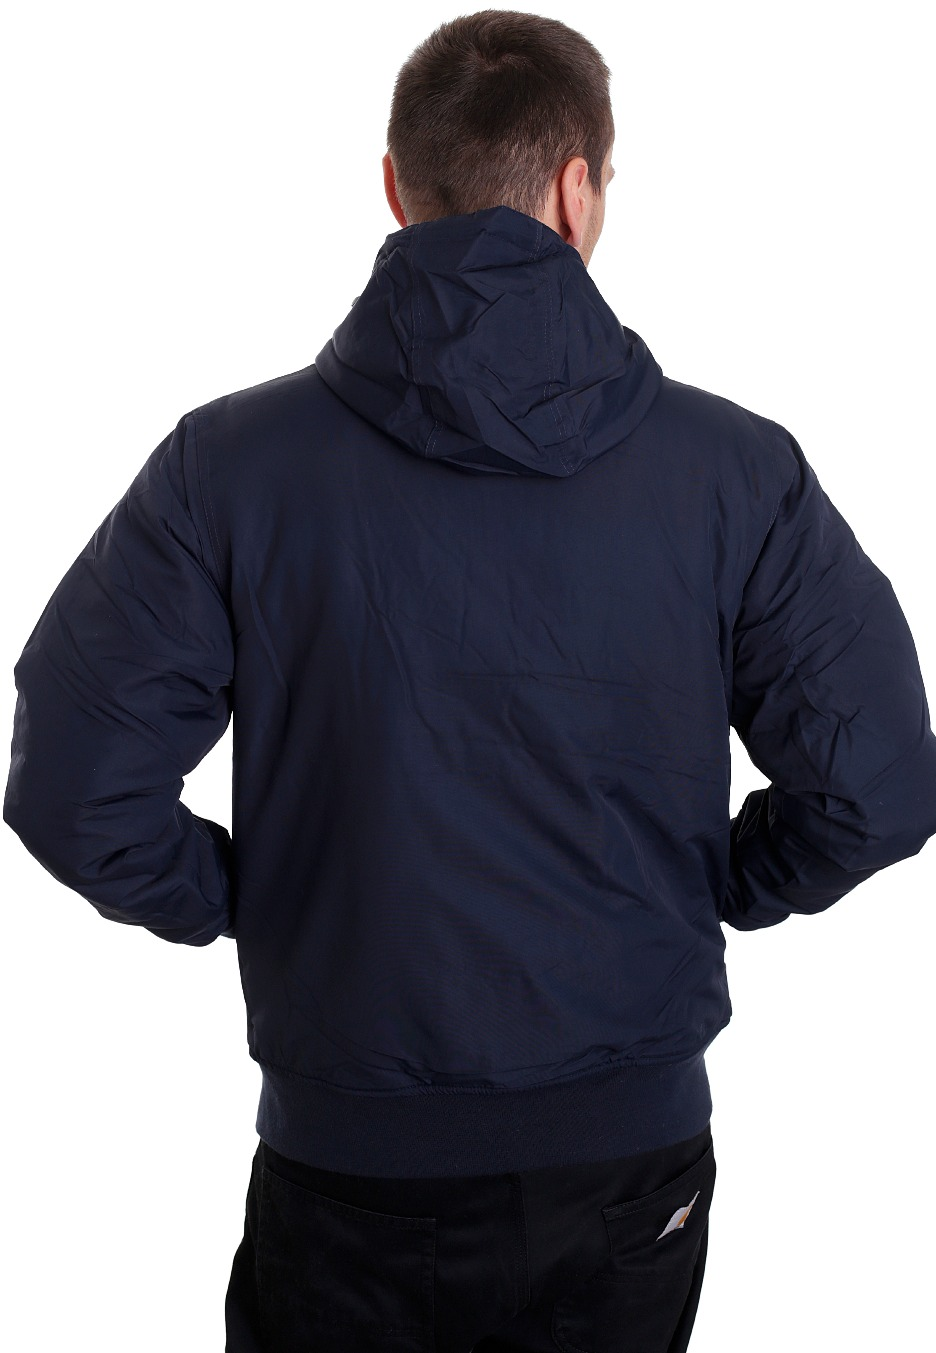 Dickies - Cornwell Dark Navy - Veste - Impericon.com FR d87a3645f817